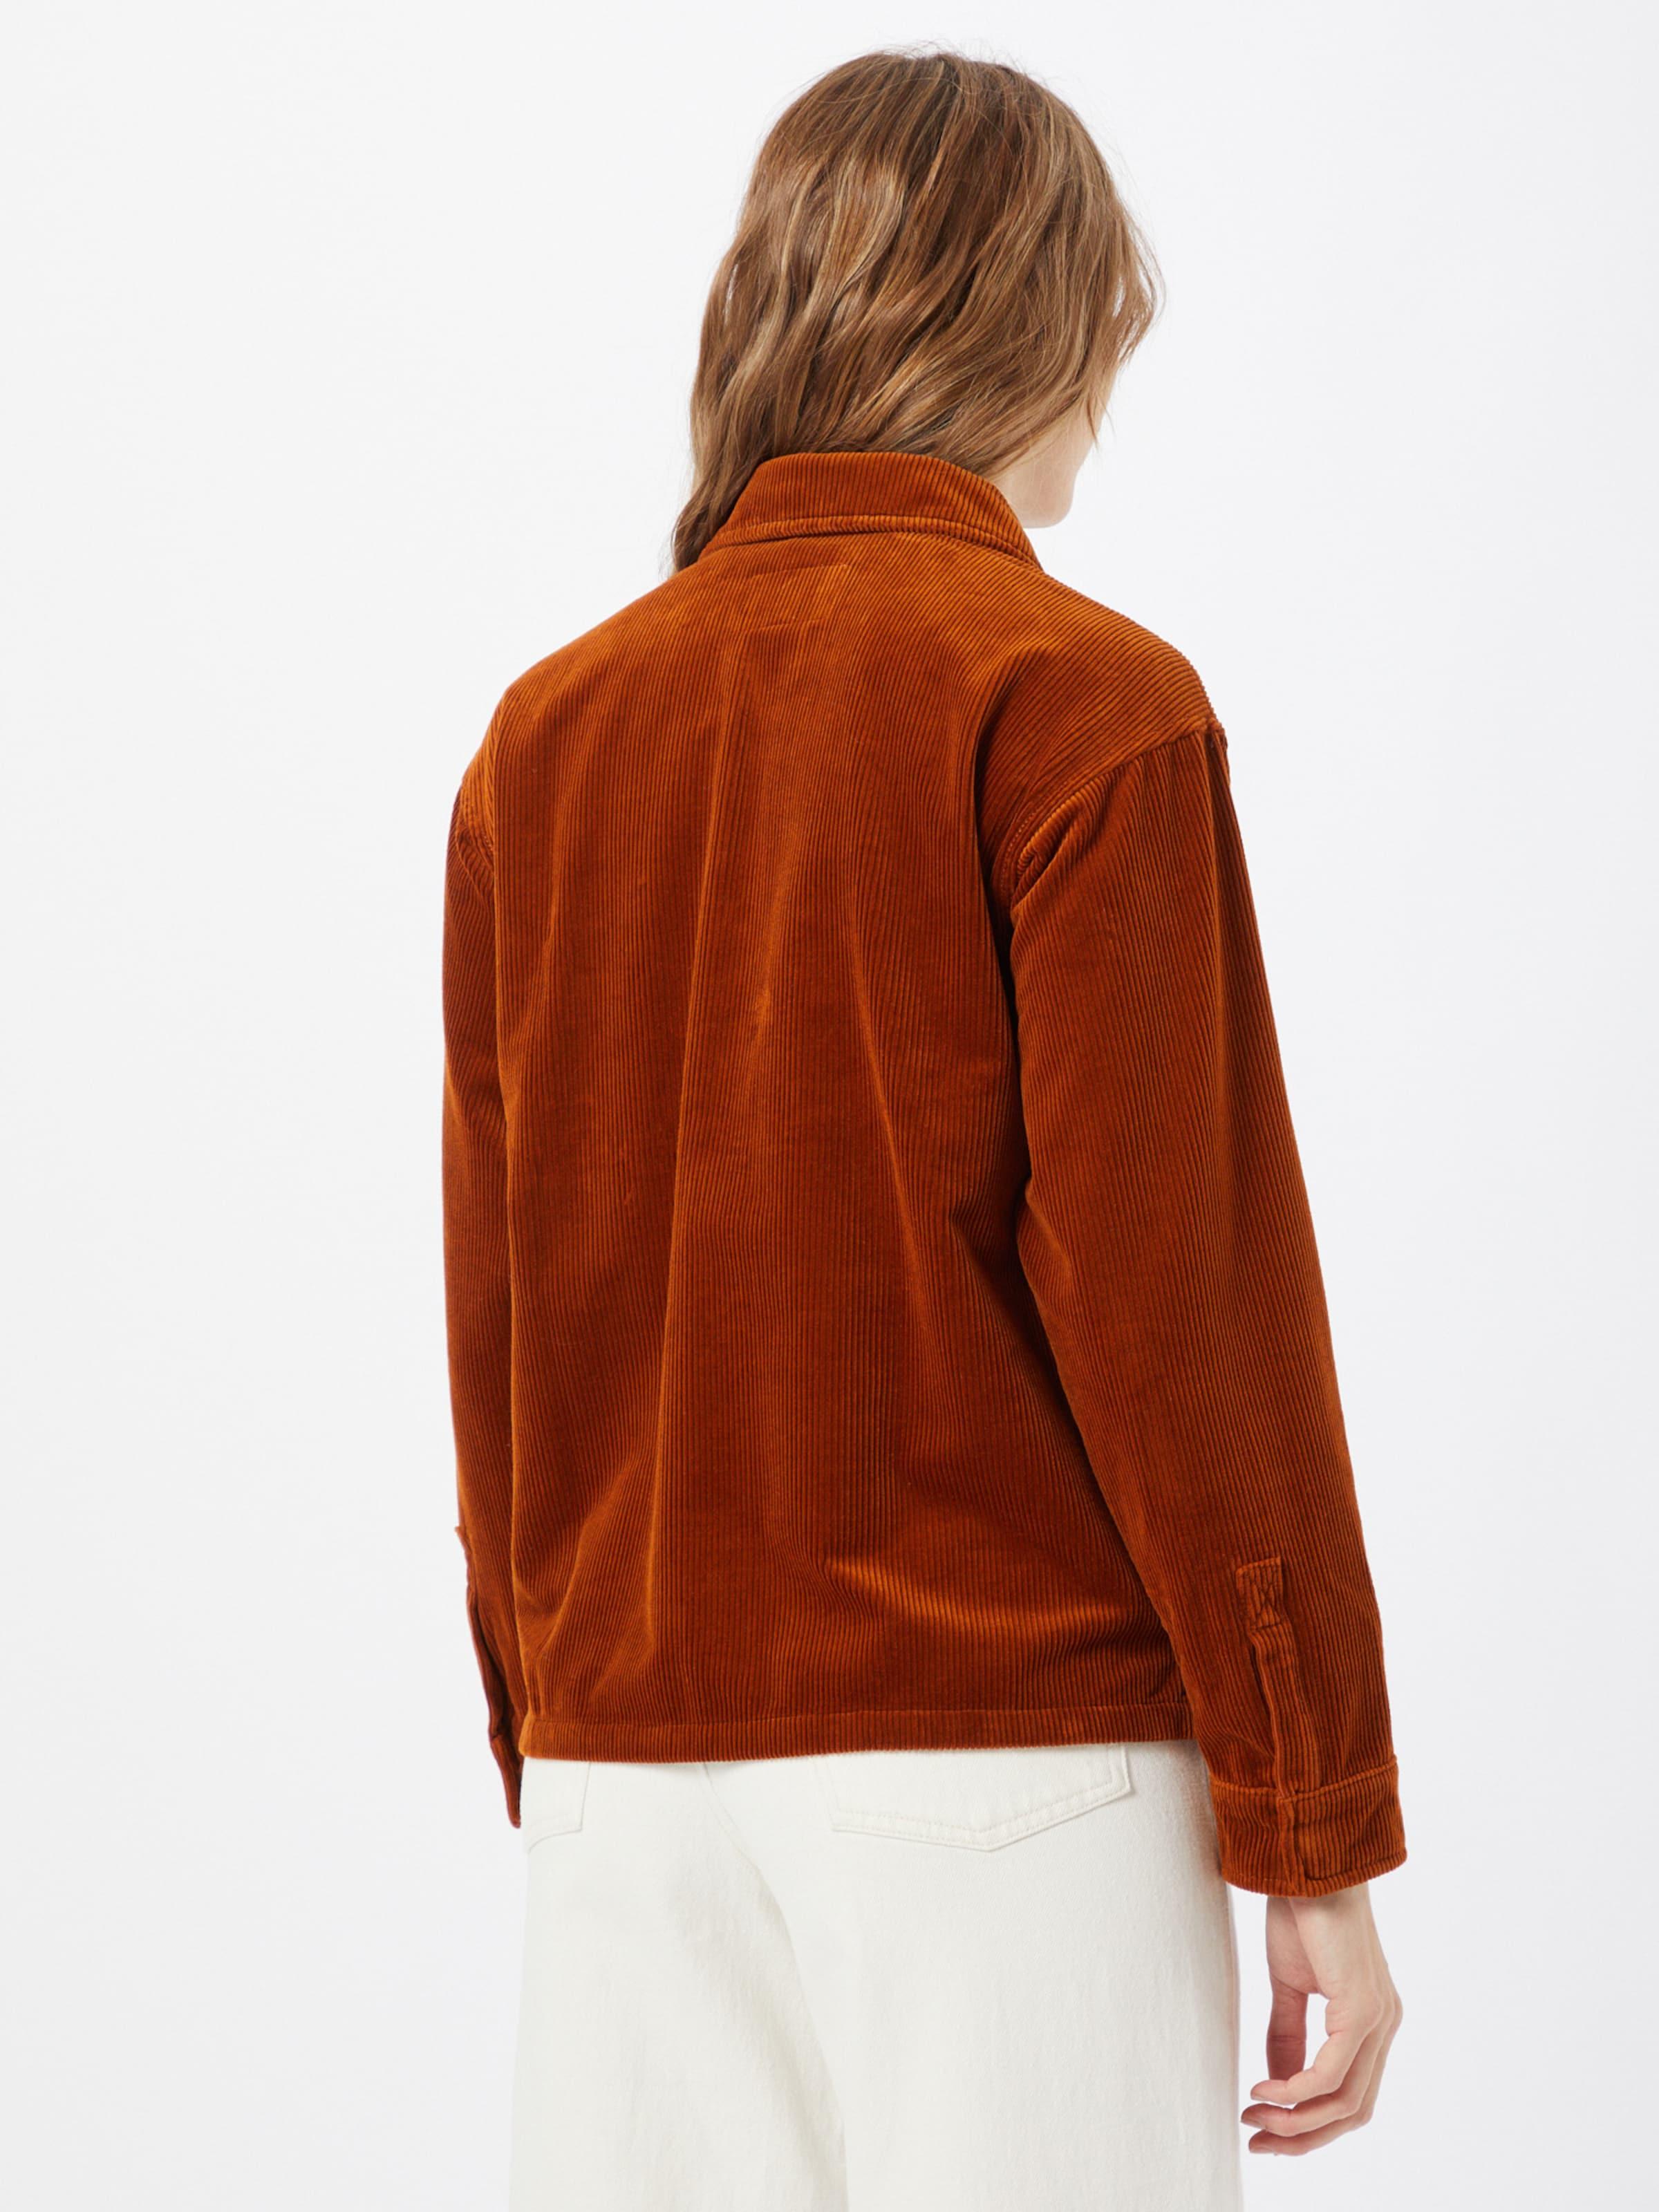 Carhartt WIP Átmeneti dzseki 'Foya' barna színben